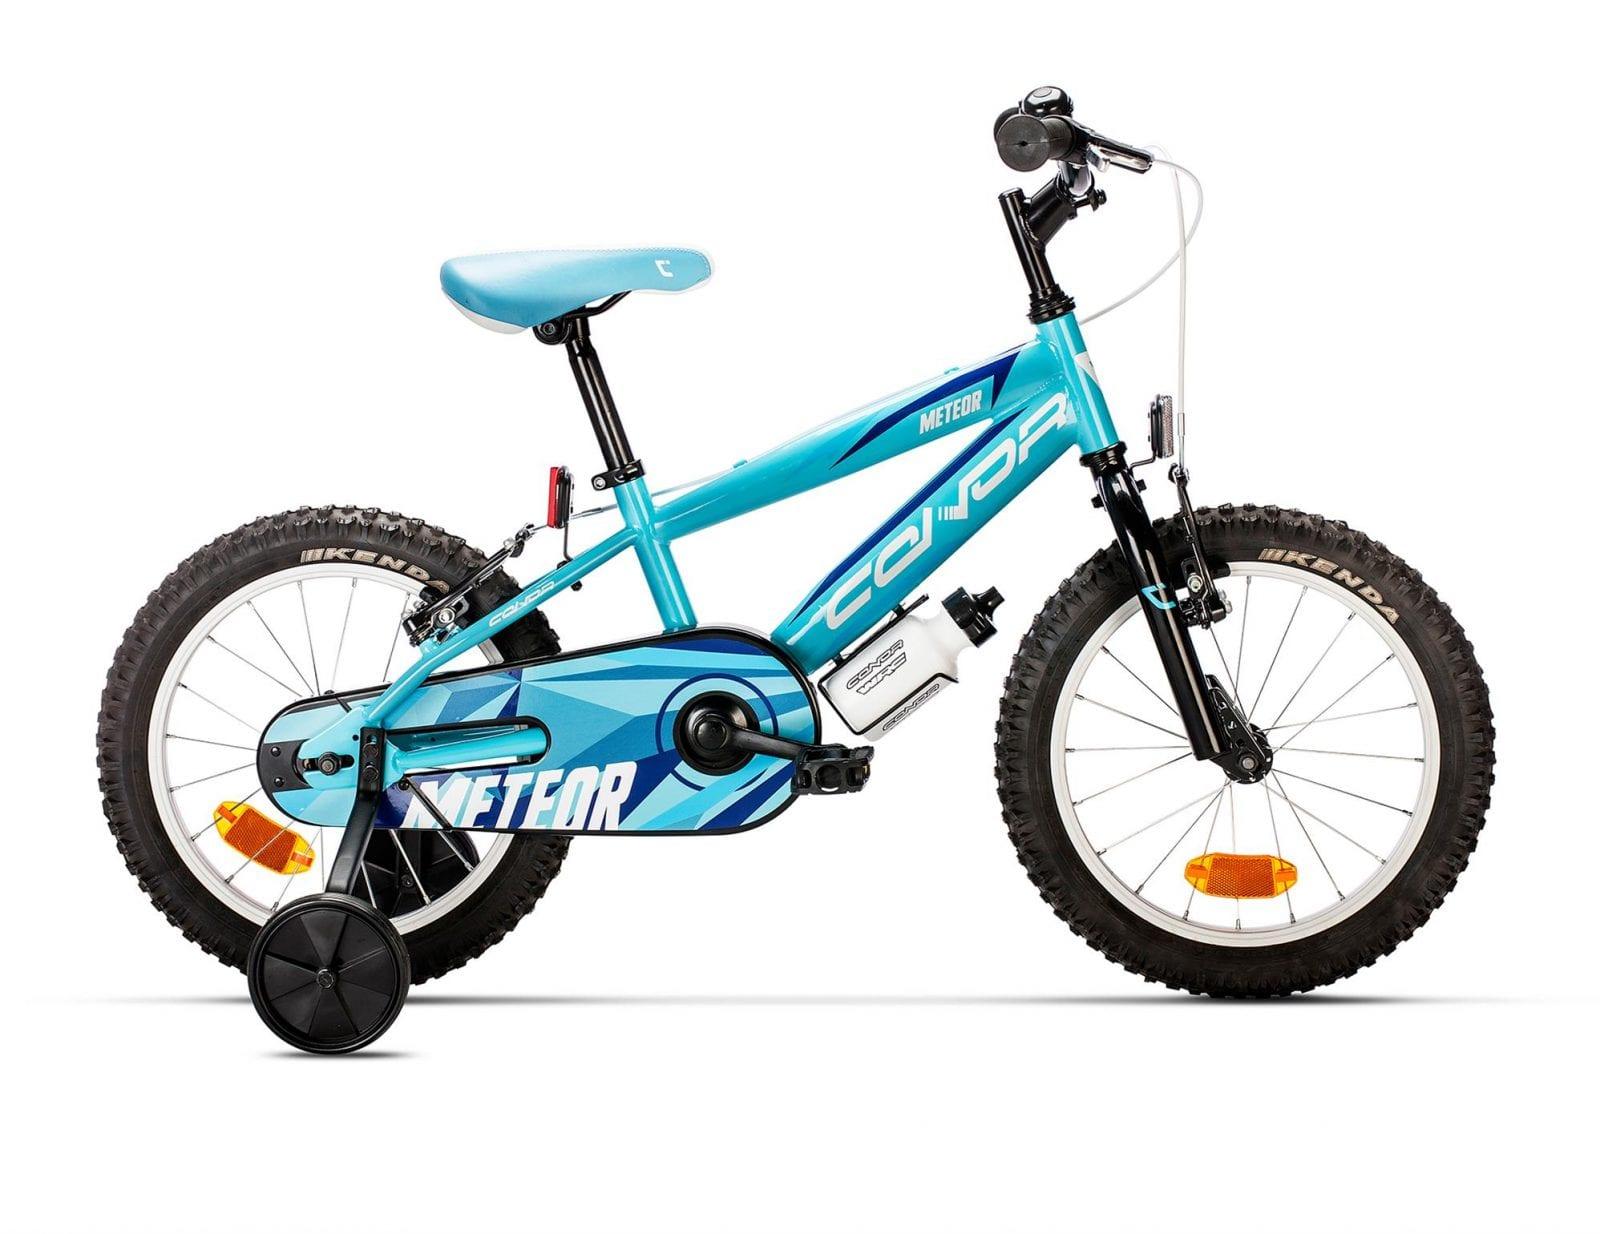 Conor-Meteor-16-Azul-Vuk-Bikes-Madrid